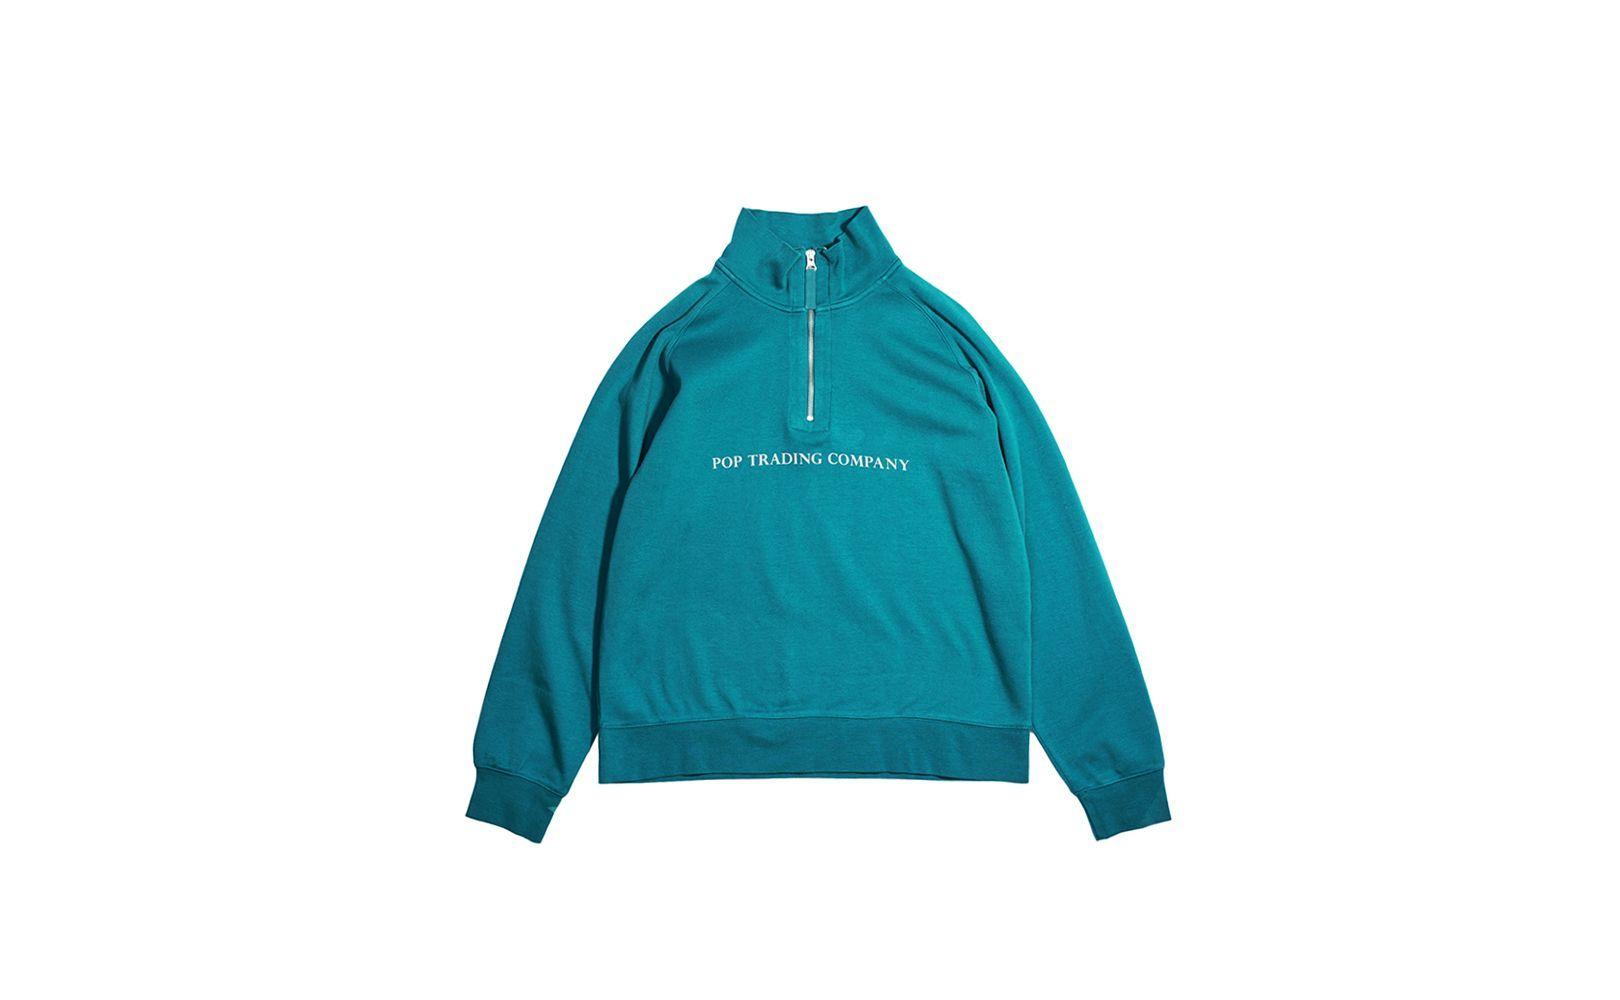 pop-trading-company-aw17-product-11sportswear-company-halfzip-dark-teal